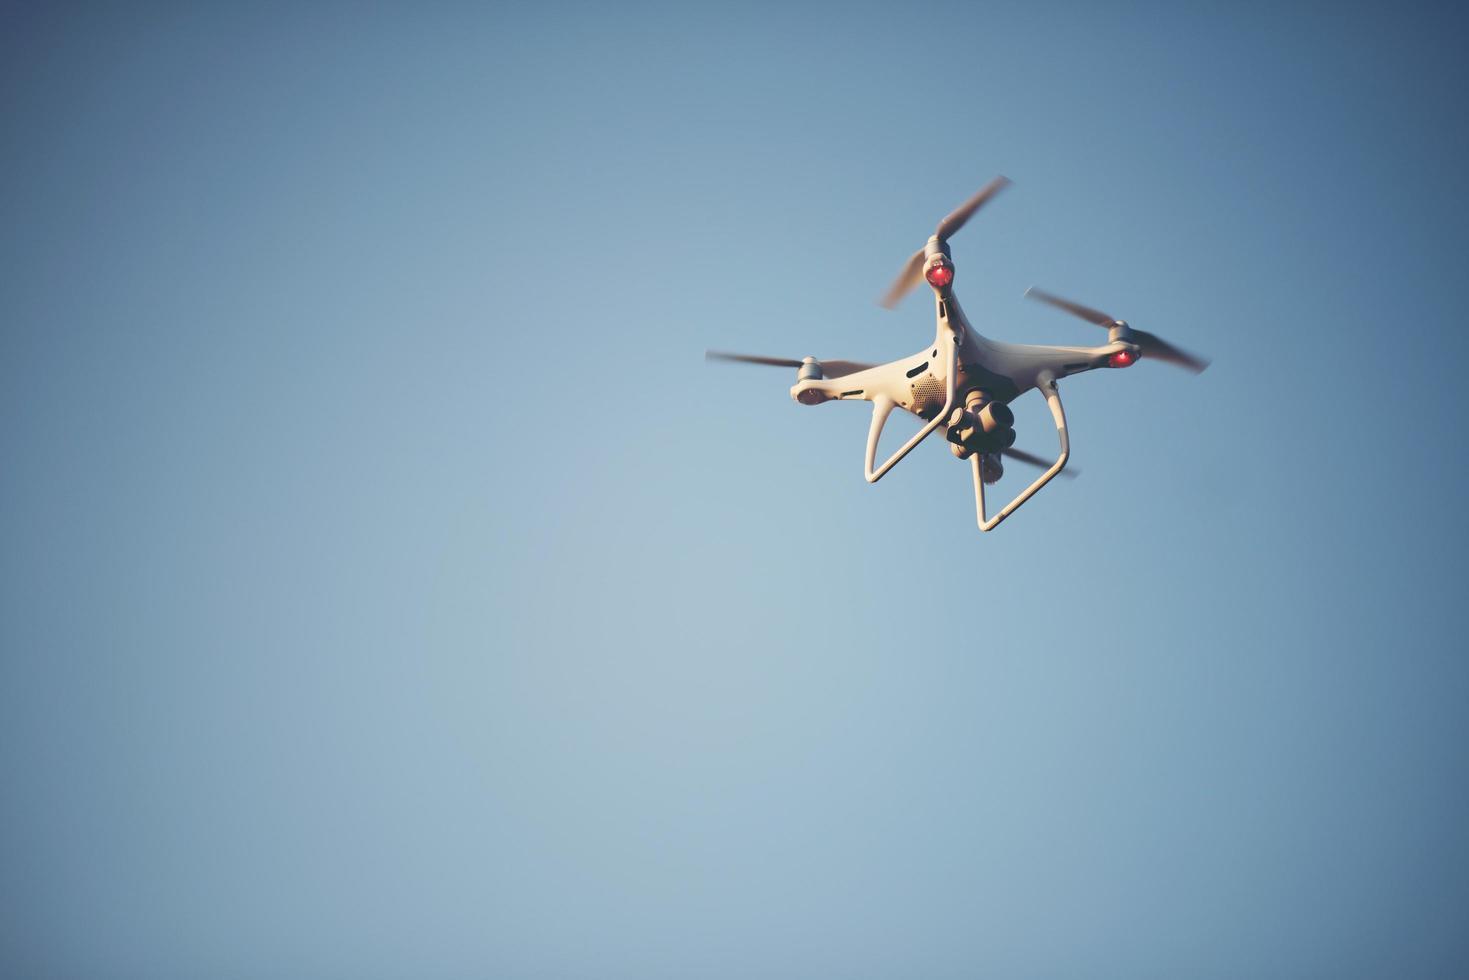 vliegende drone in de lucht foto